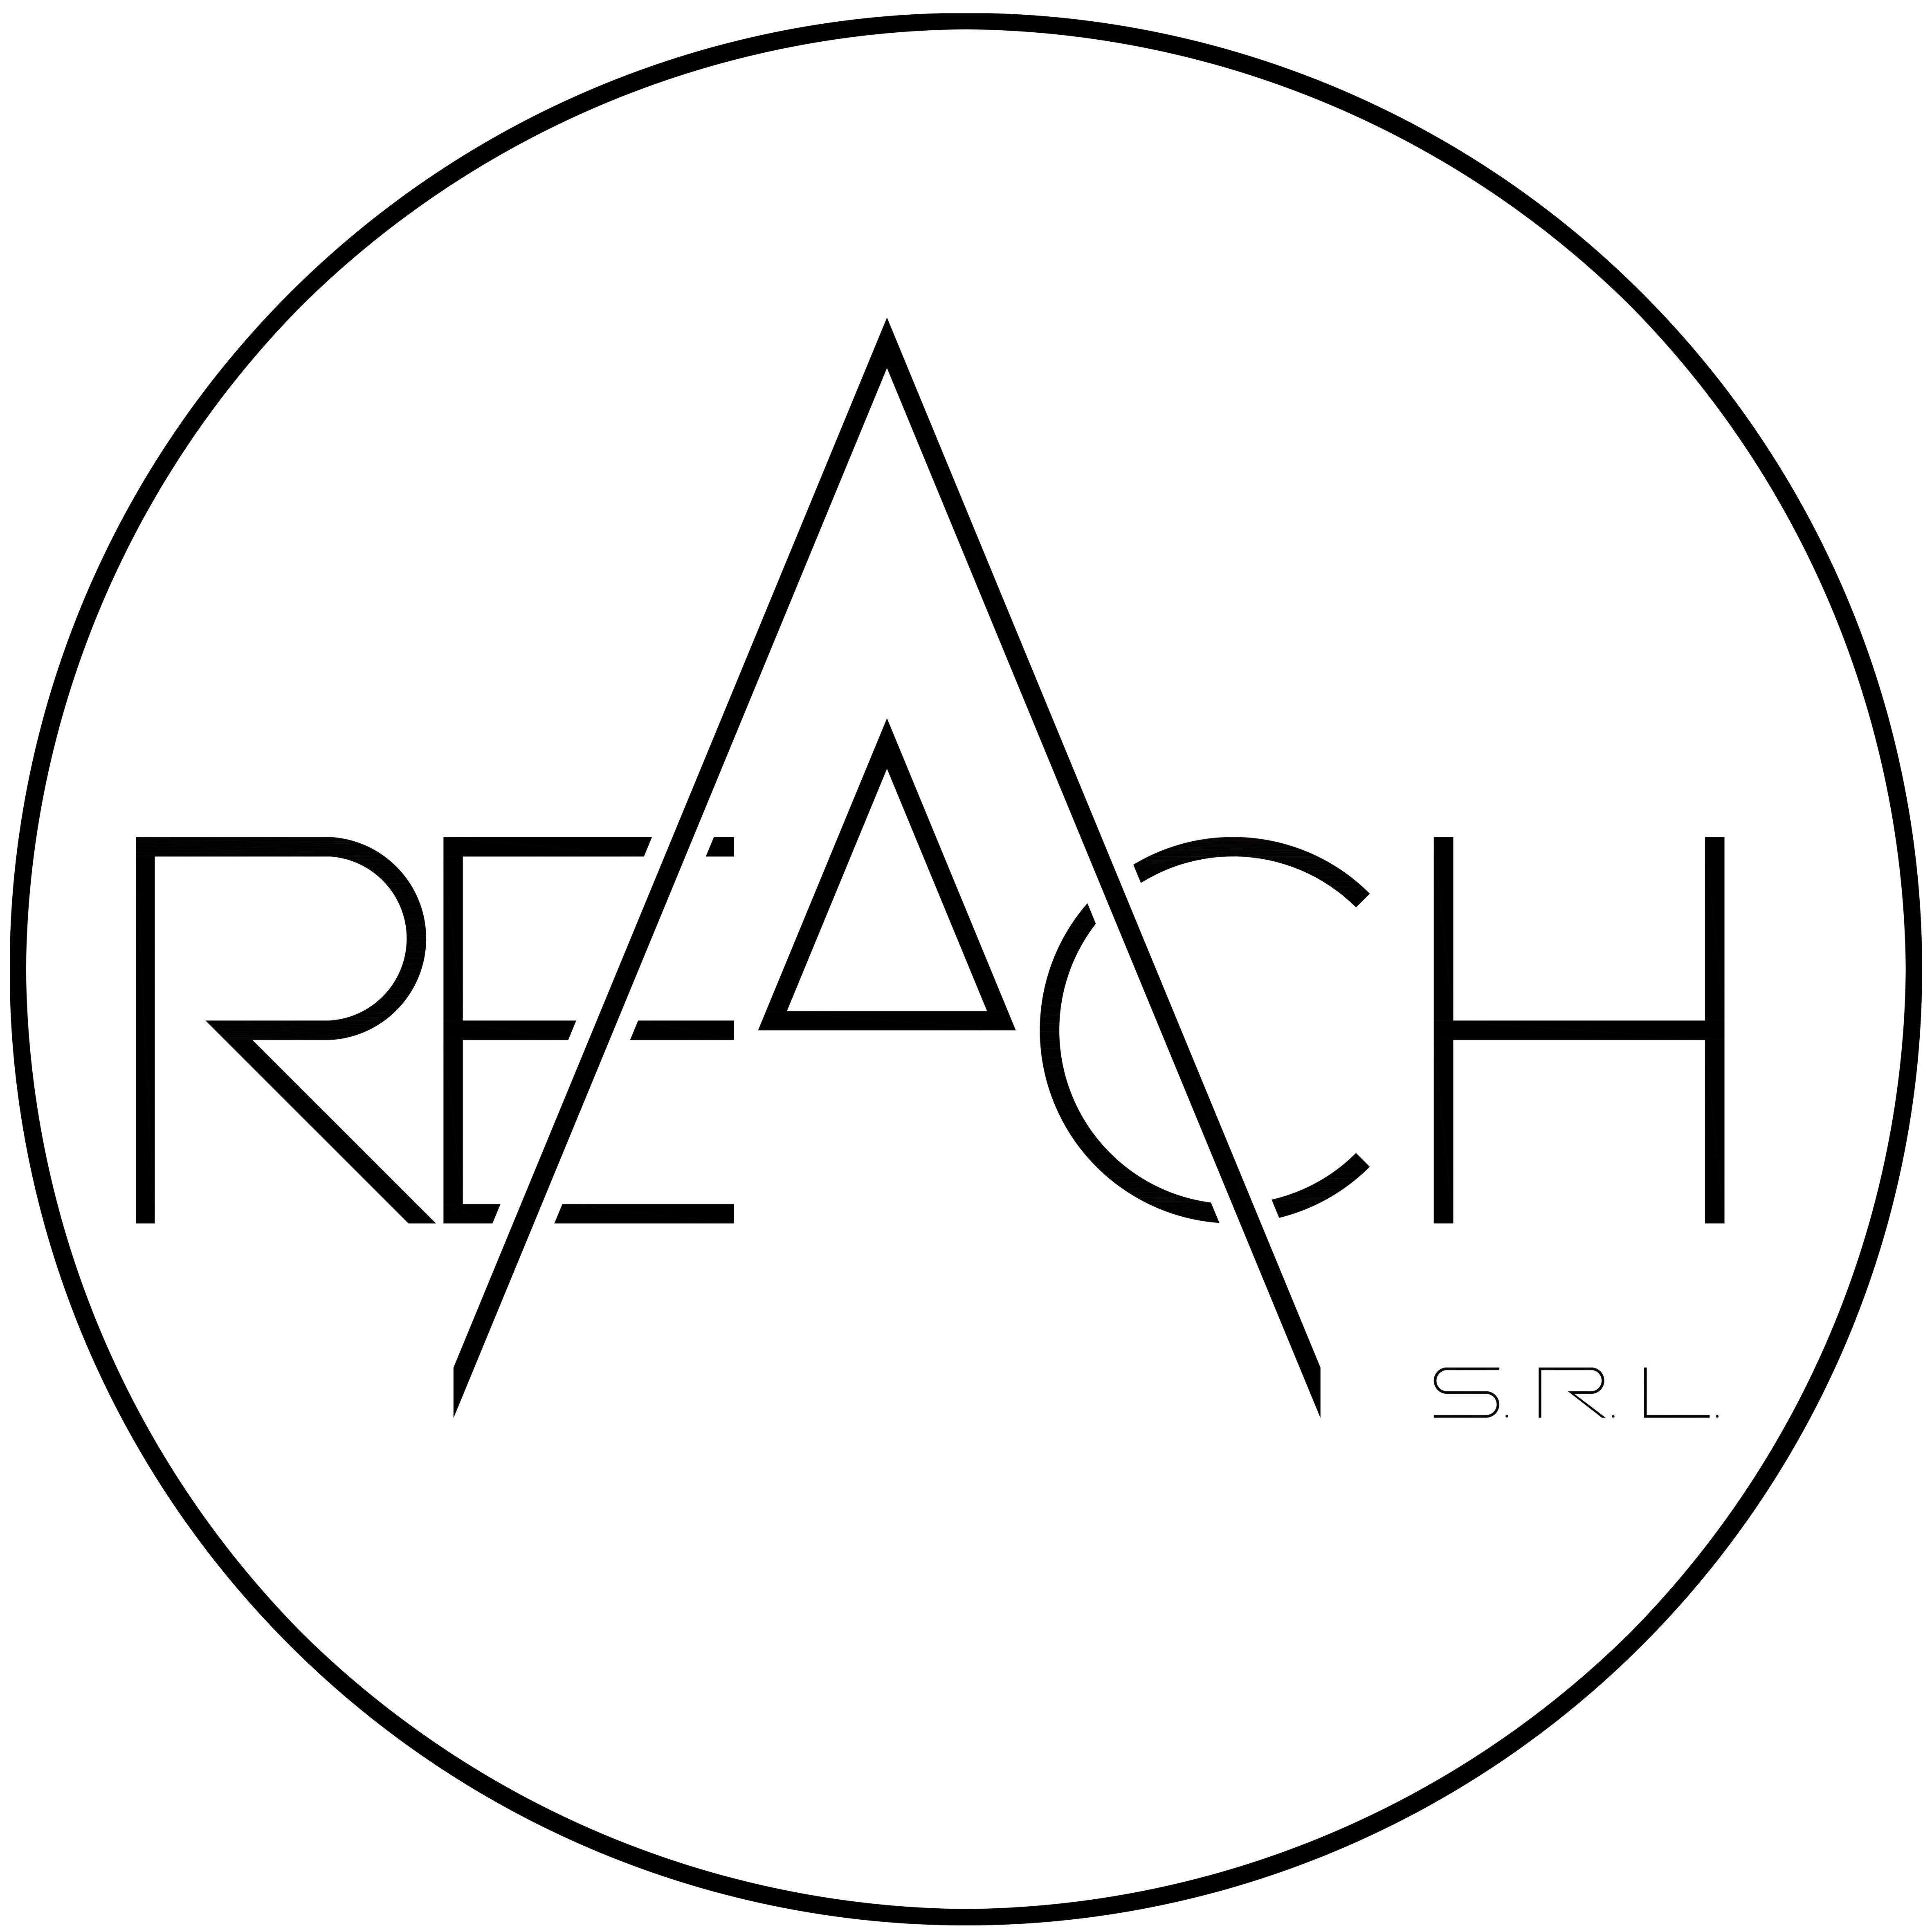 REACH srl